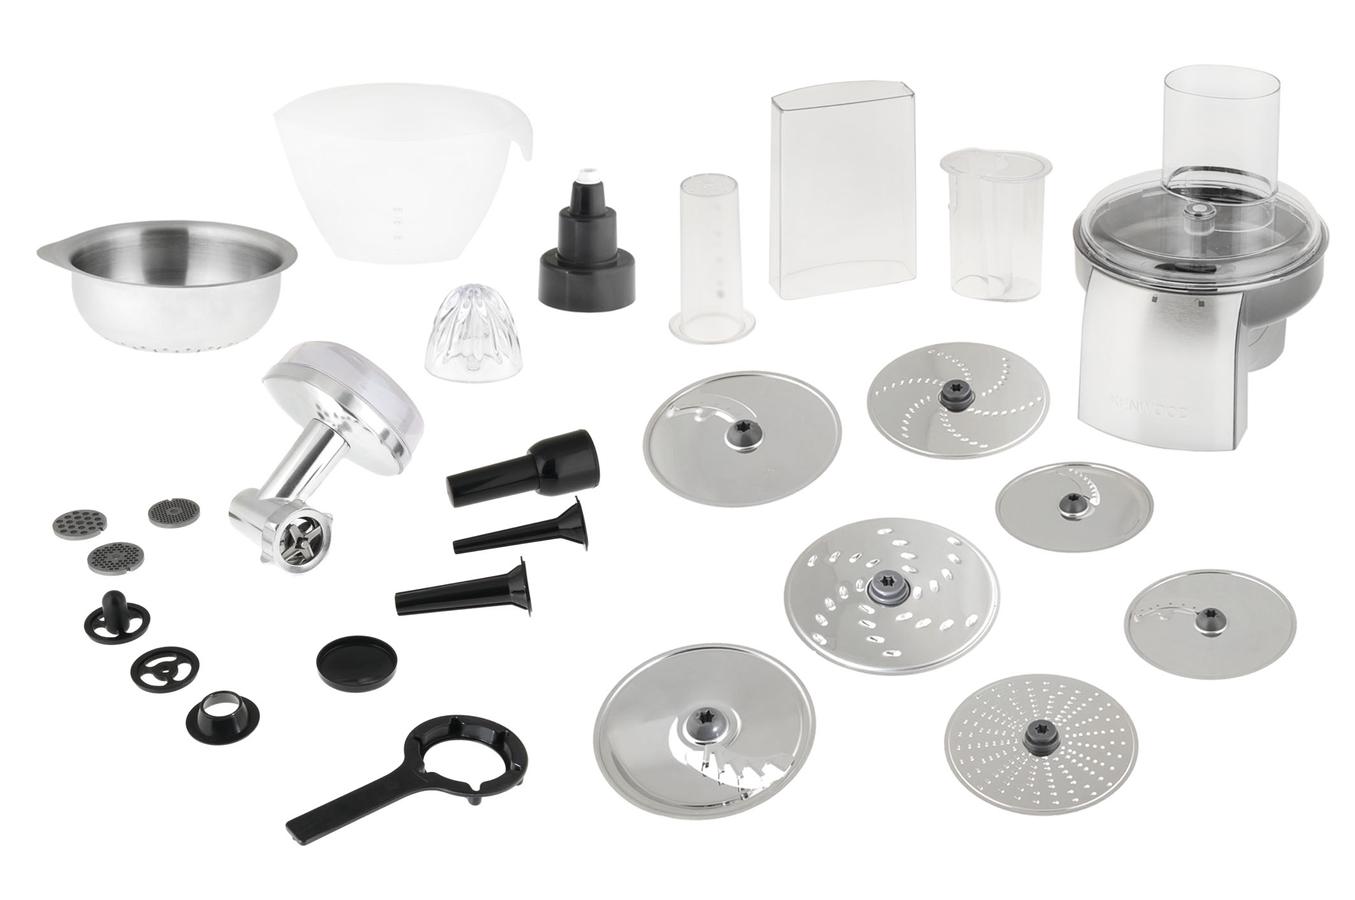 accessoire robot kenwood ma350 kit 3 accessoires ma350 1270036 darty. Black Bedroom Furniture Sets. Home Design Ideas